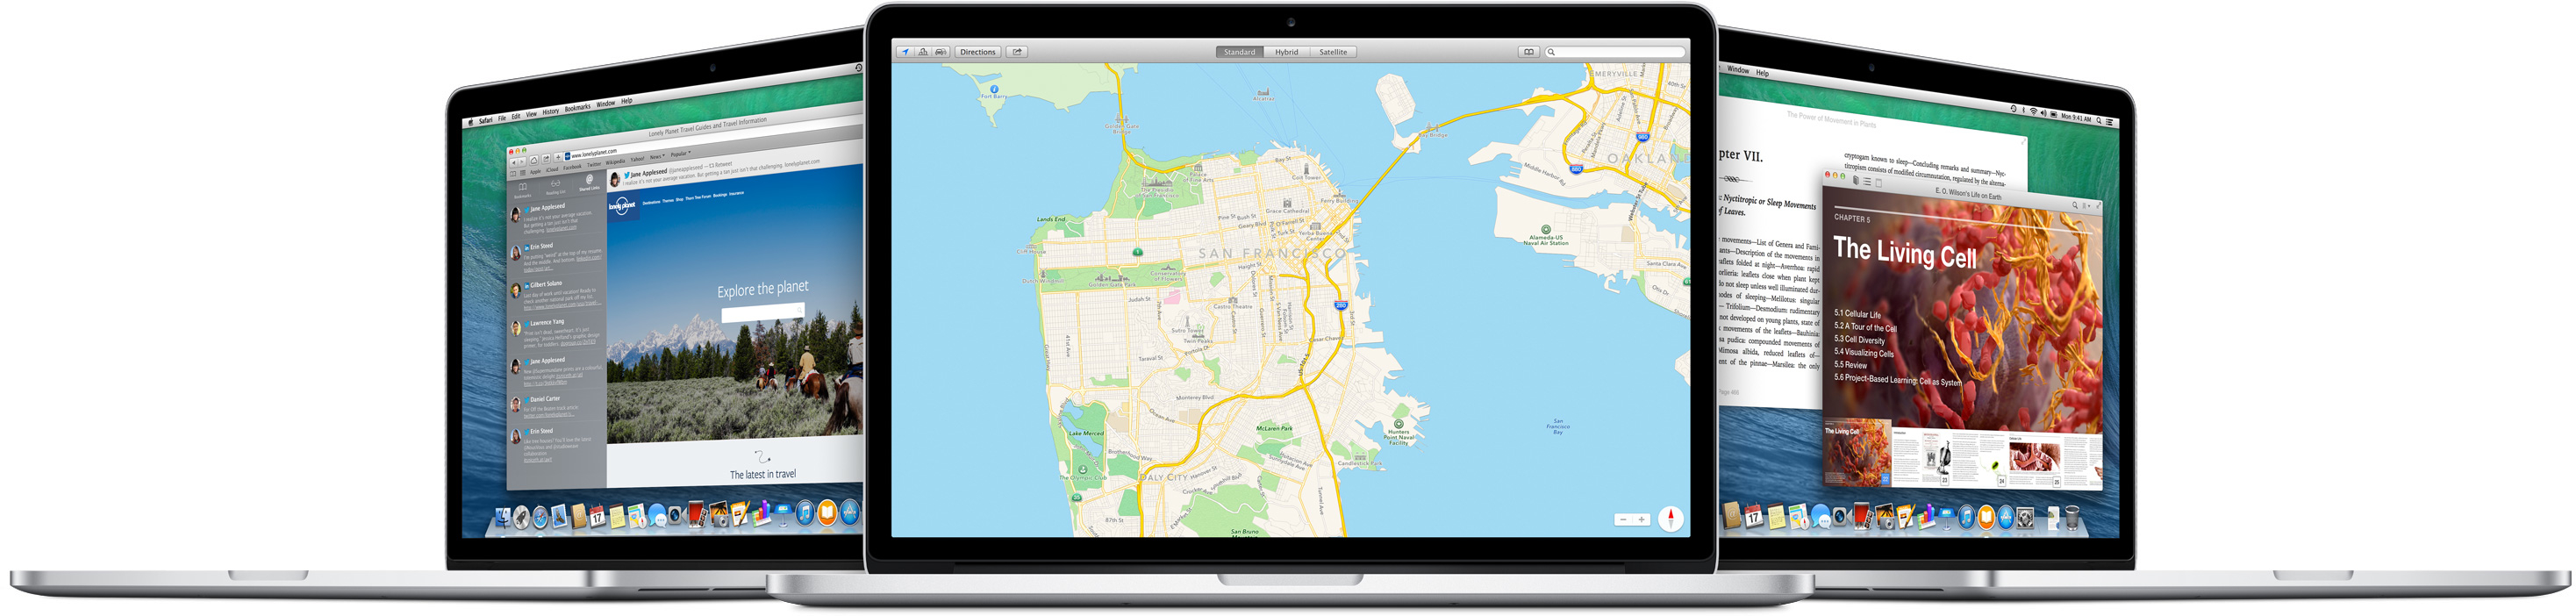 OS X Mavericks rodando em MacBooks Pro Retina